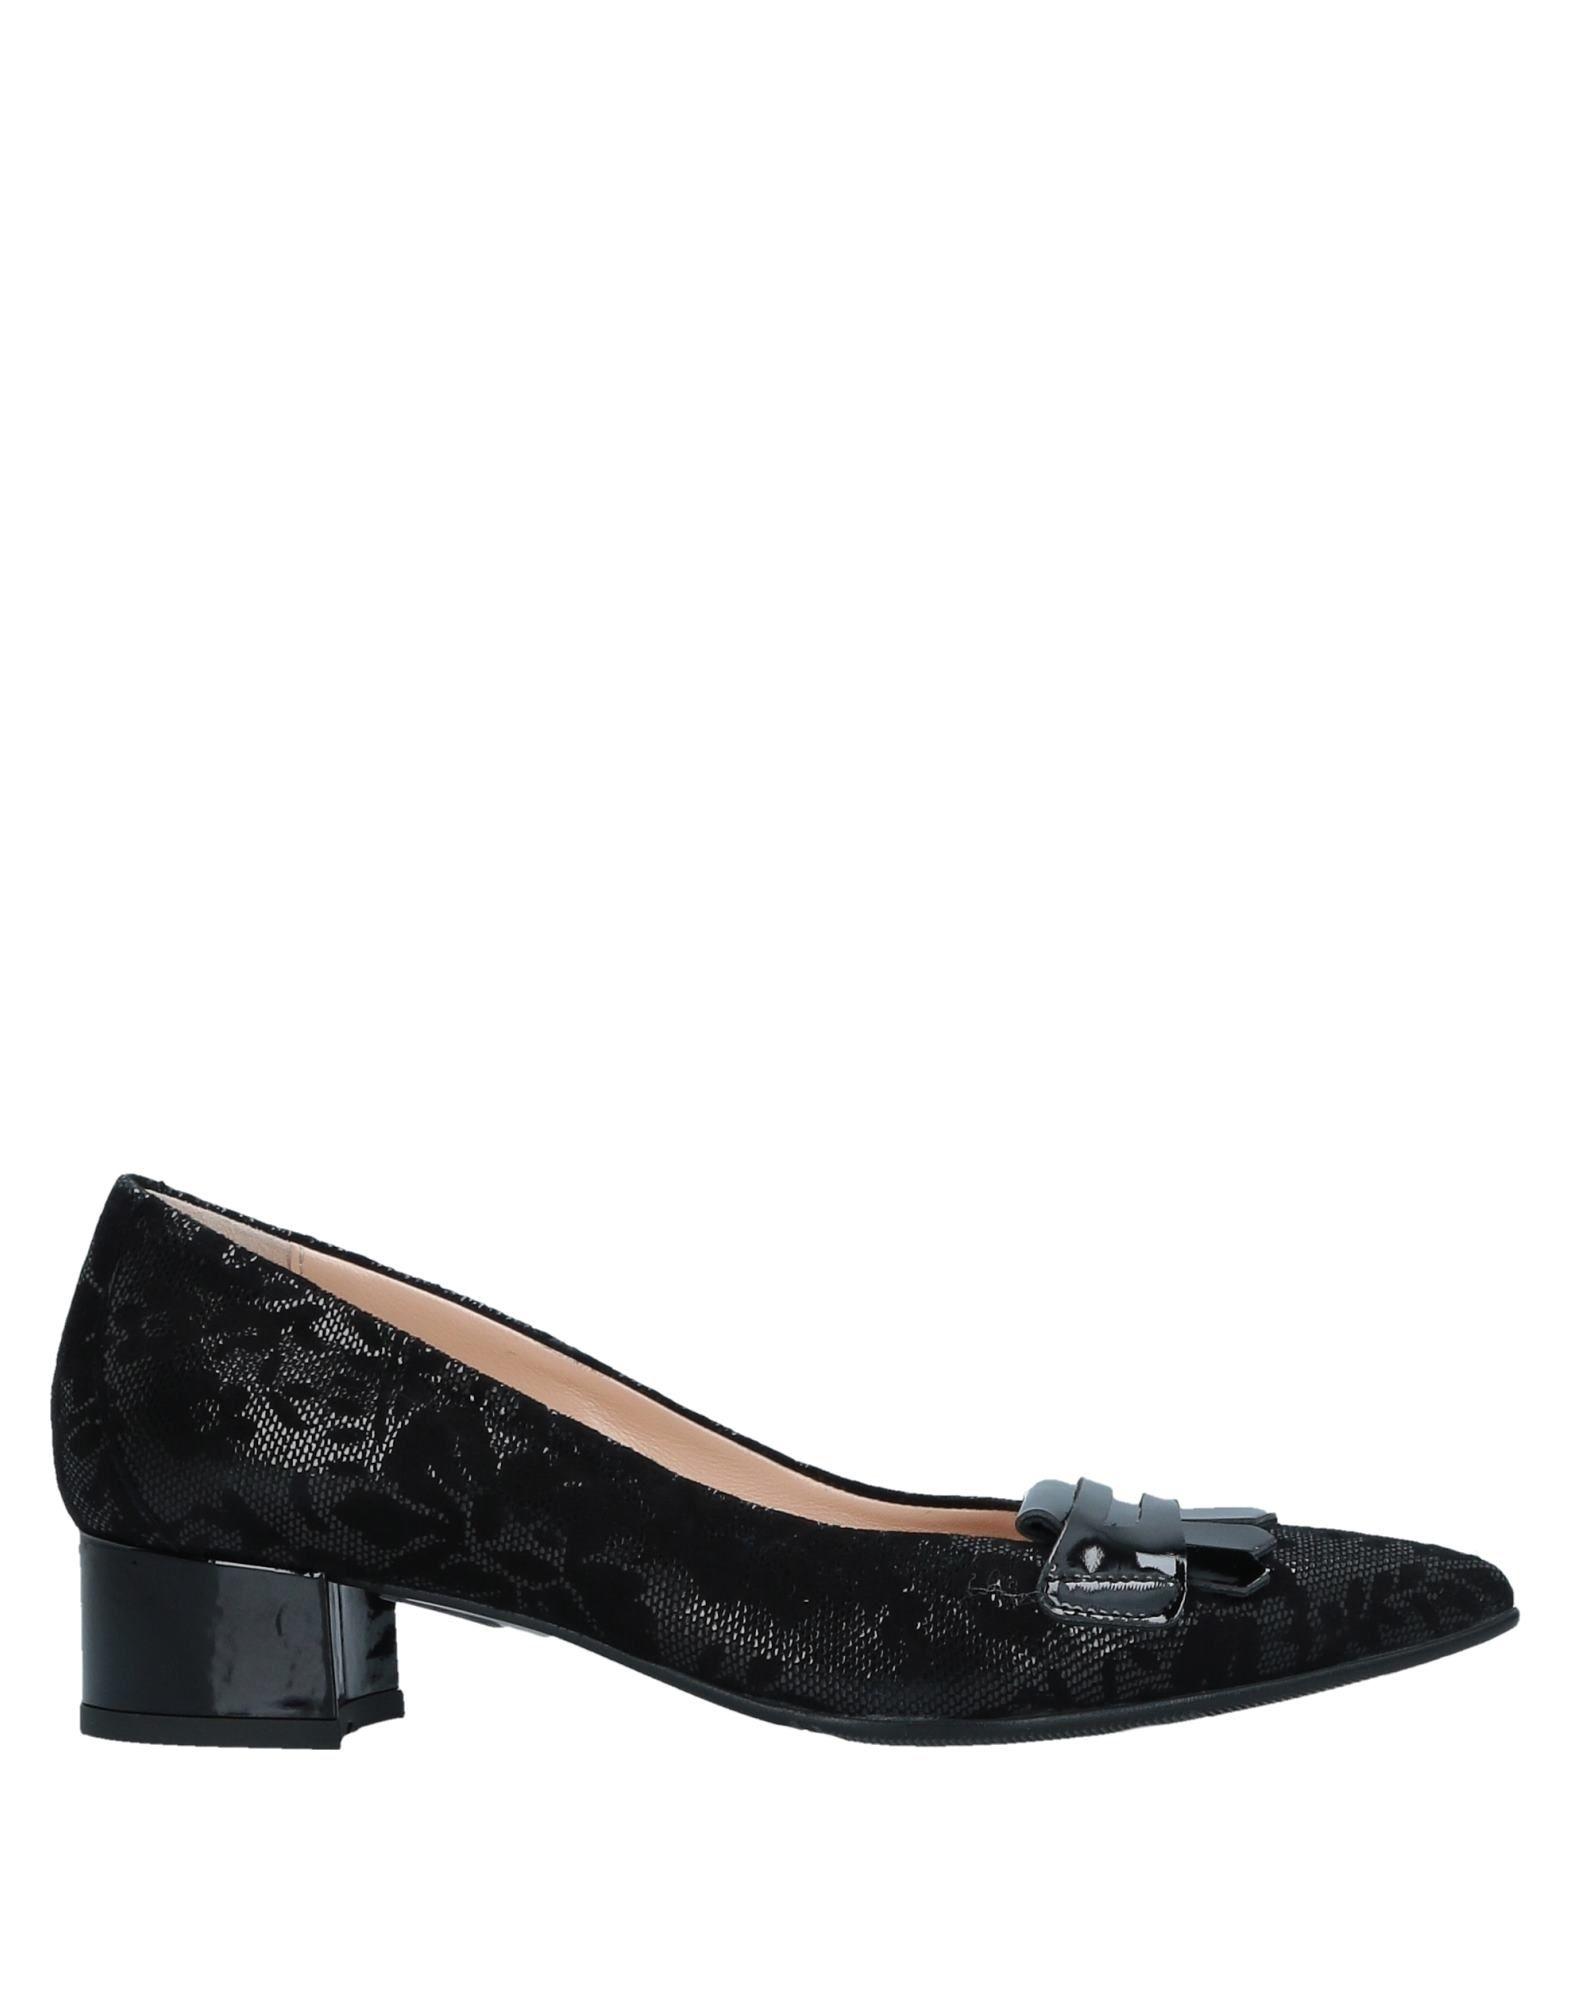 F.Lli Bruglia Mokassins Damen  11517758ONGut aussehende strapazierfähige Schuhe